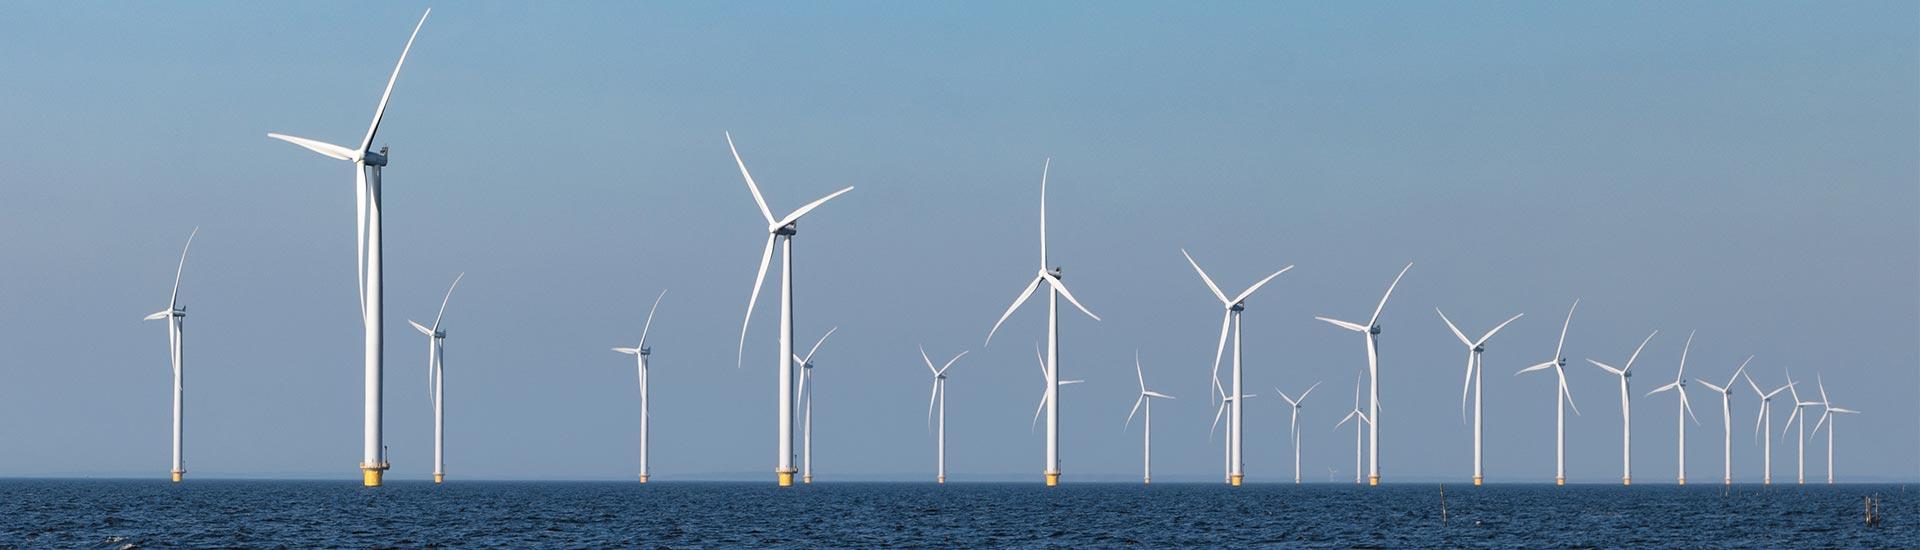 Rope access specialist windenergie